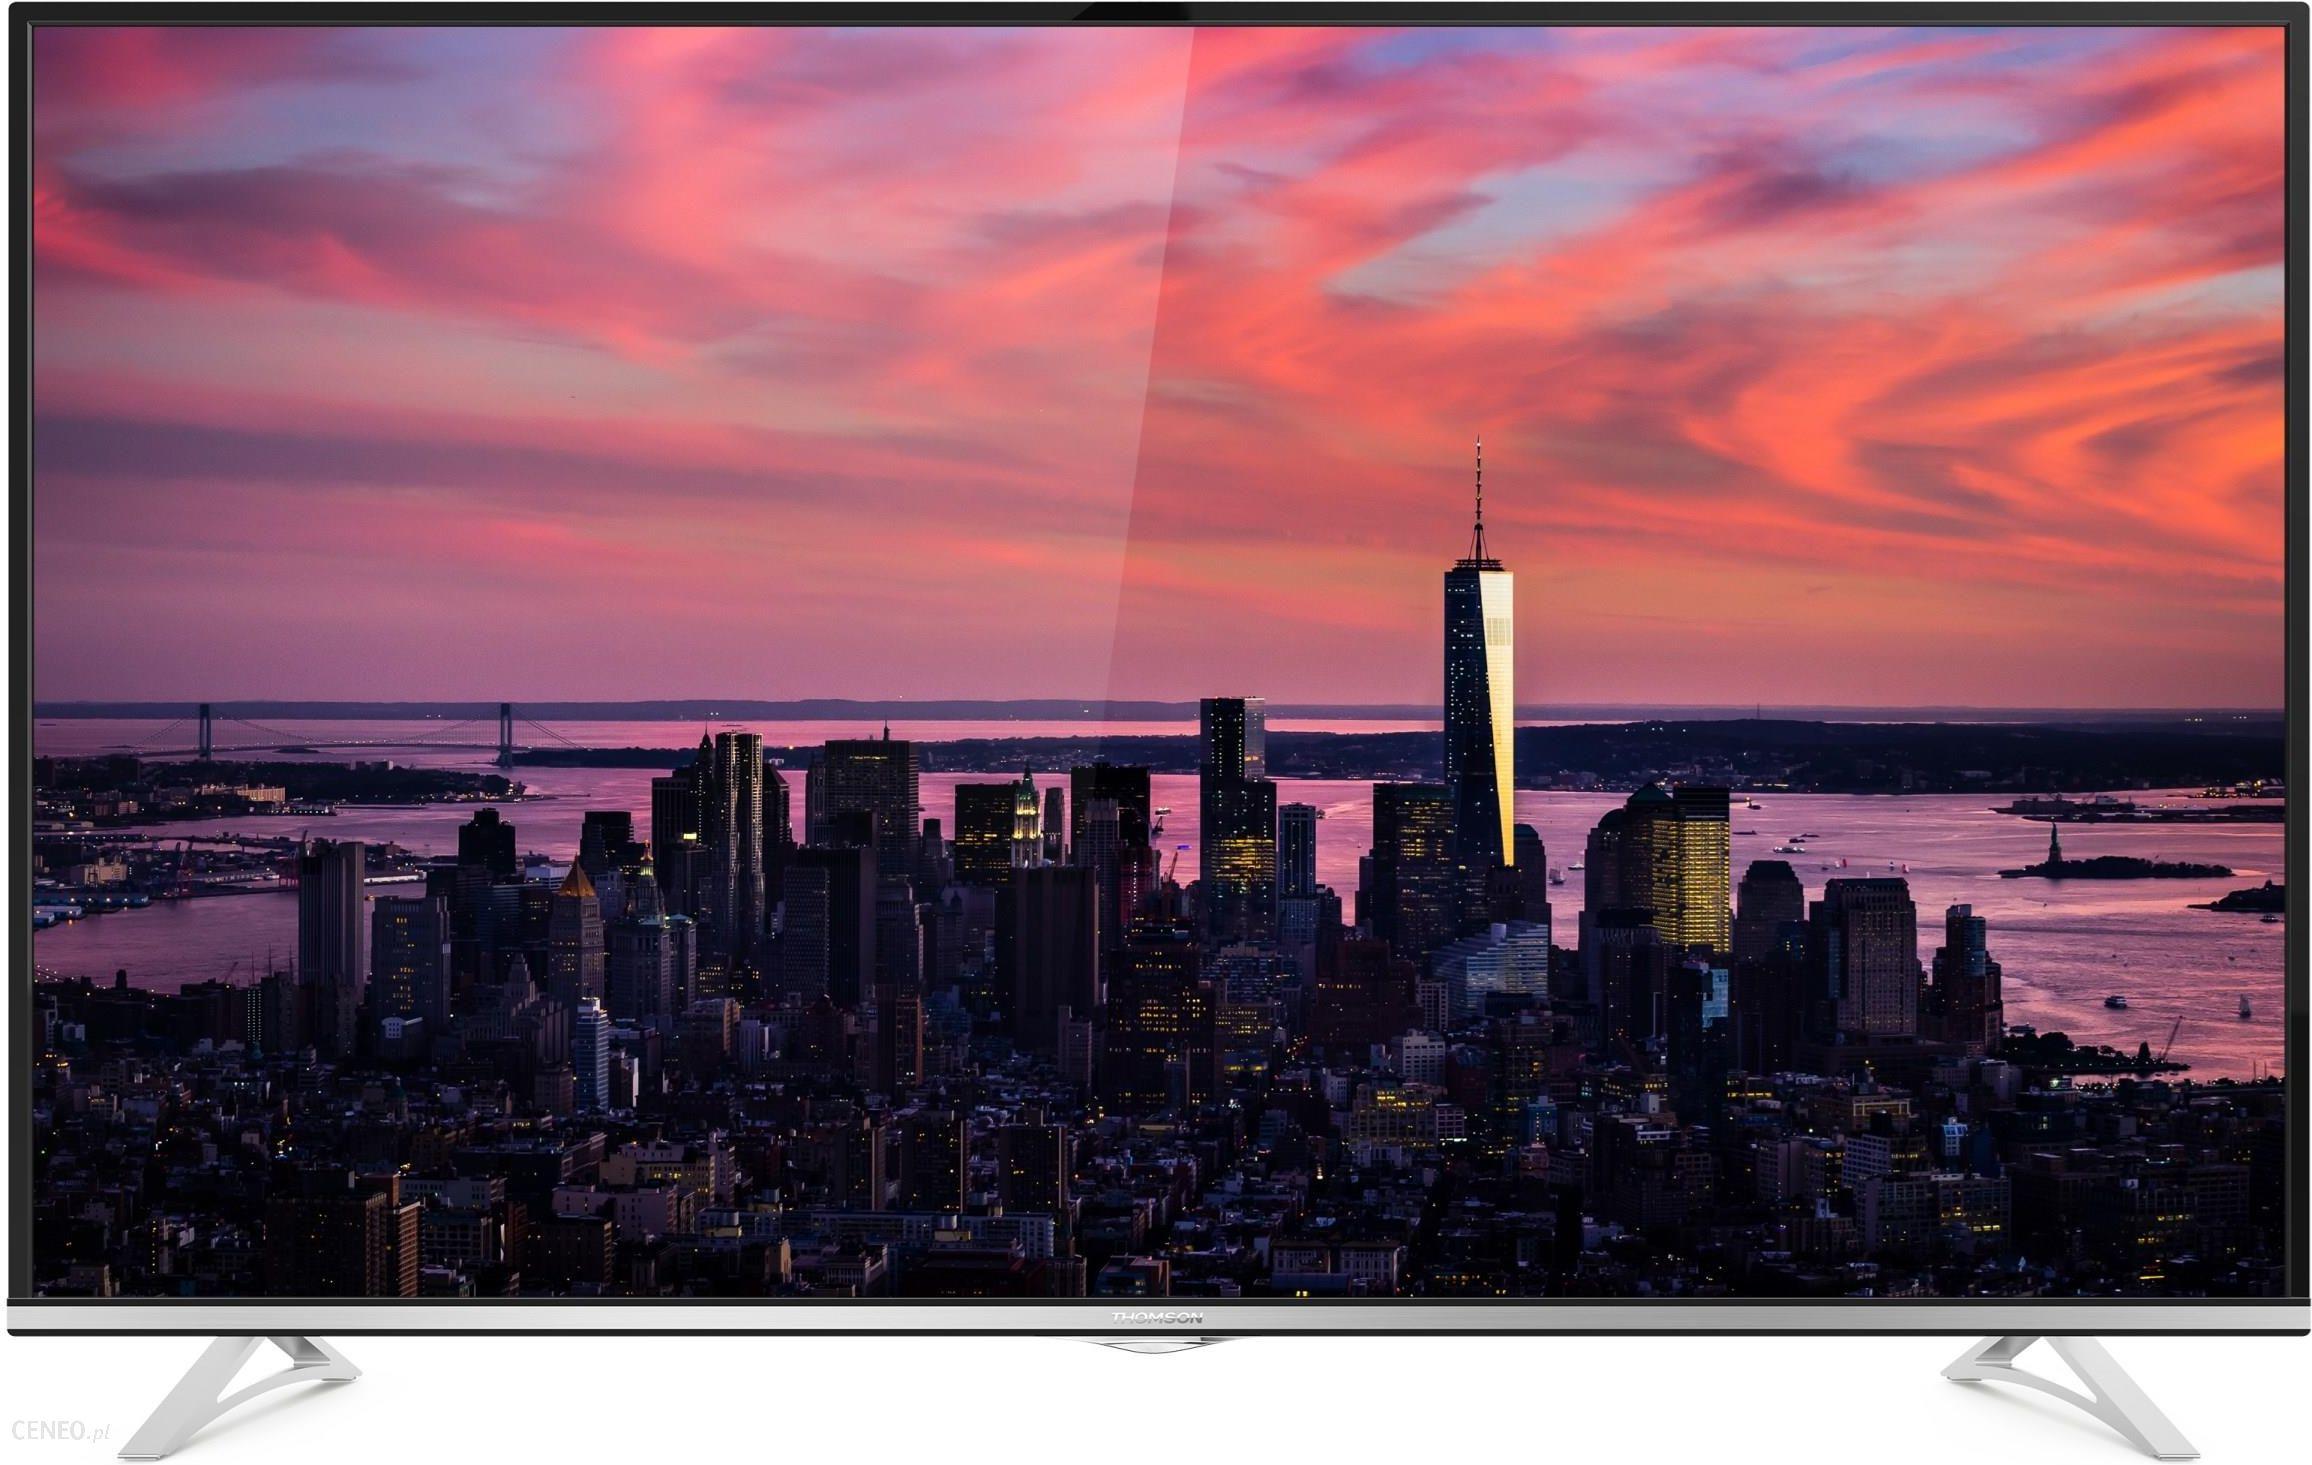 ec3827bb4ea98 Telewizor Thomson 55UA6406 4K UHD 55 cali - Opinie i ceny na Ceneo.pl